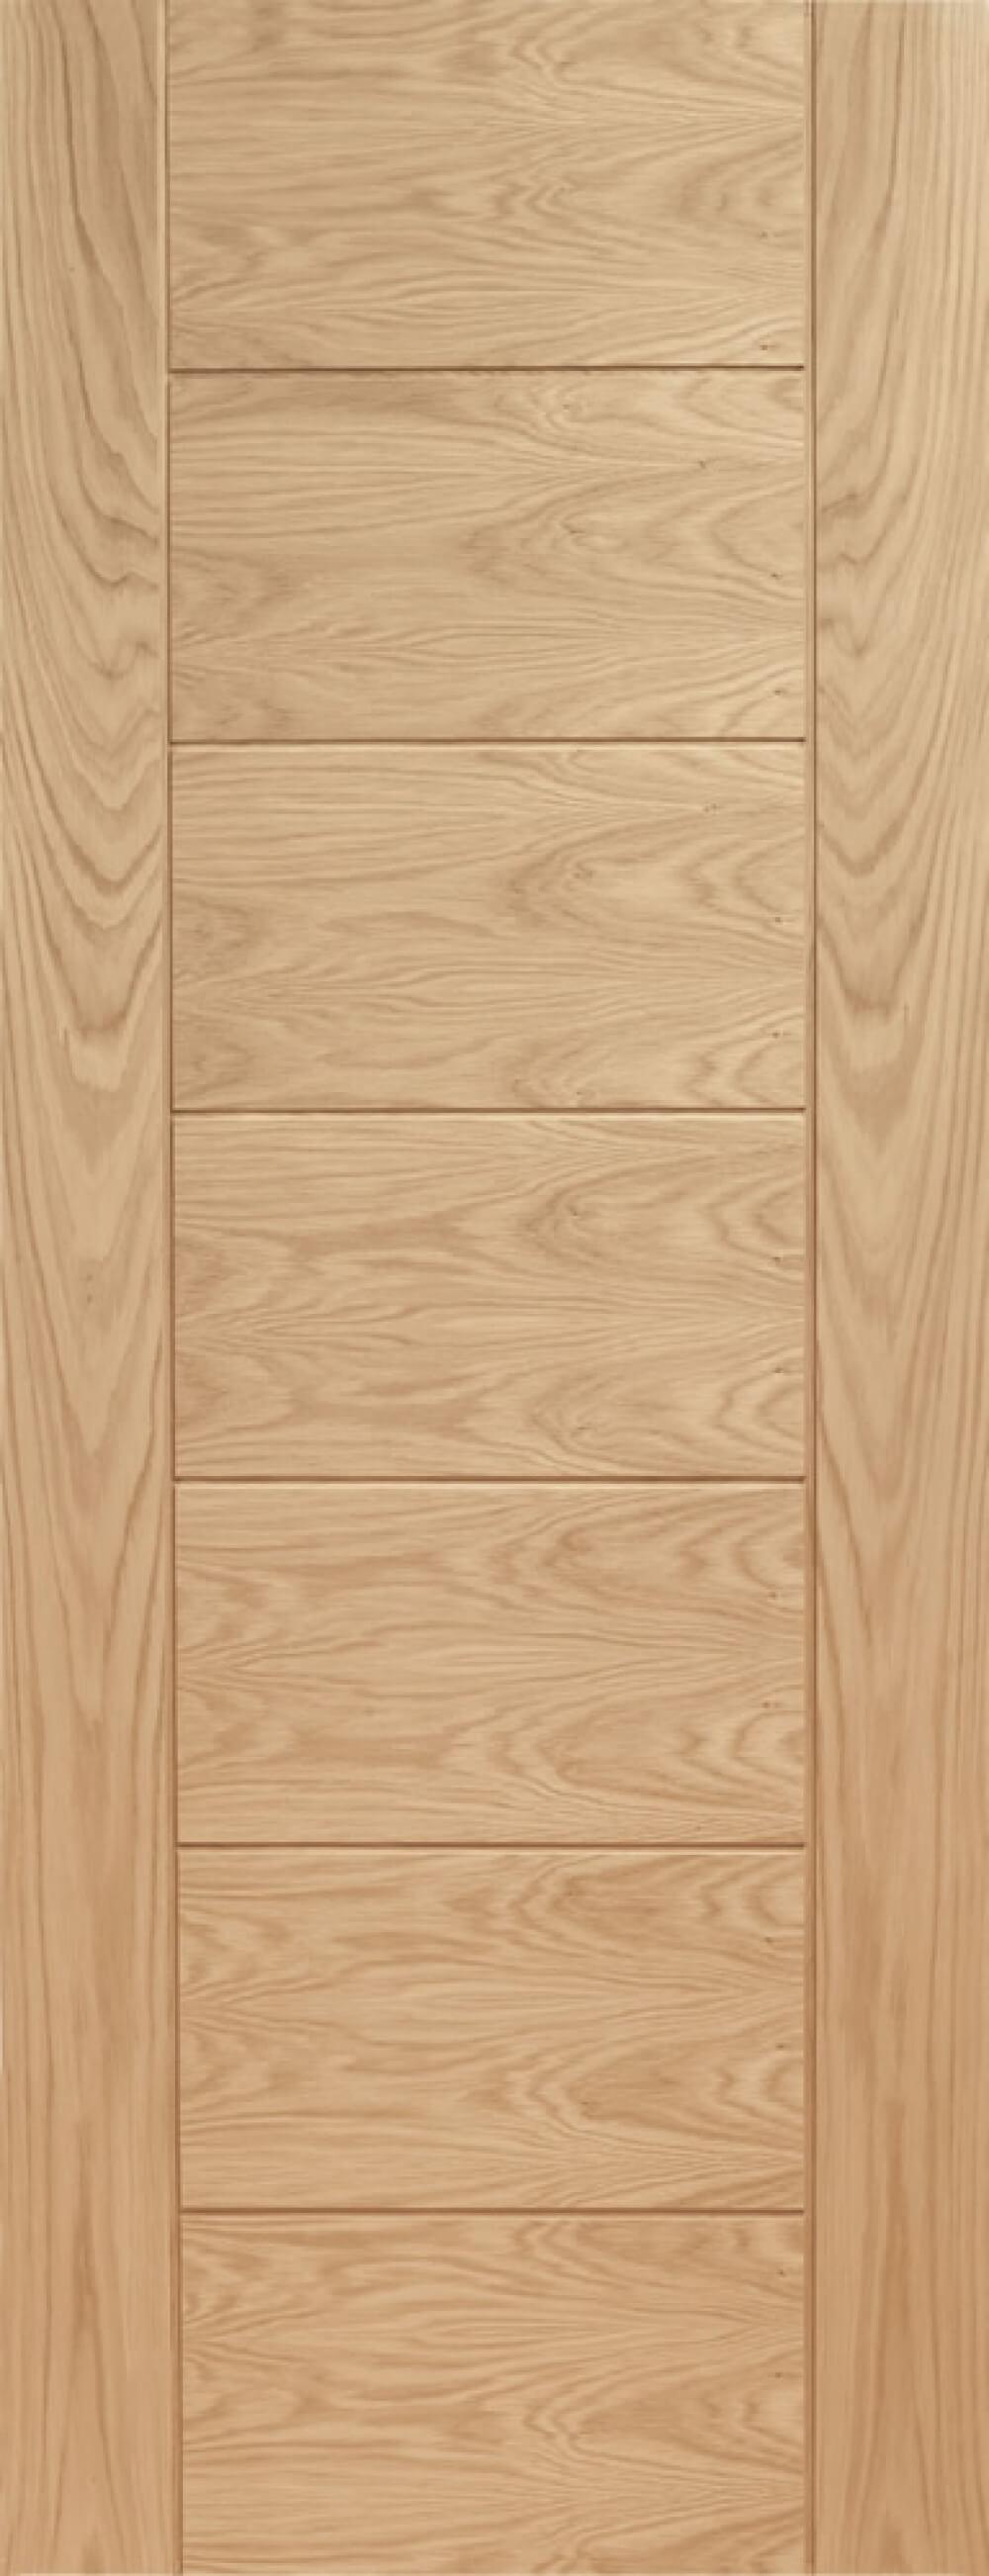 Palermo Oak Door - PREFINISHED